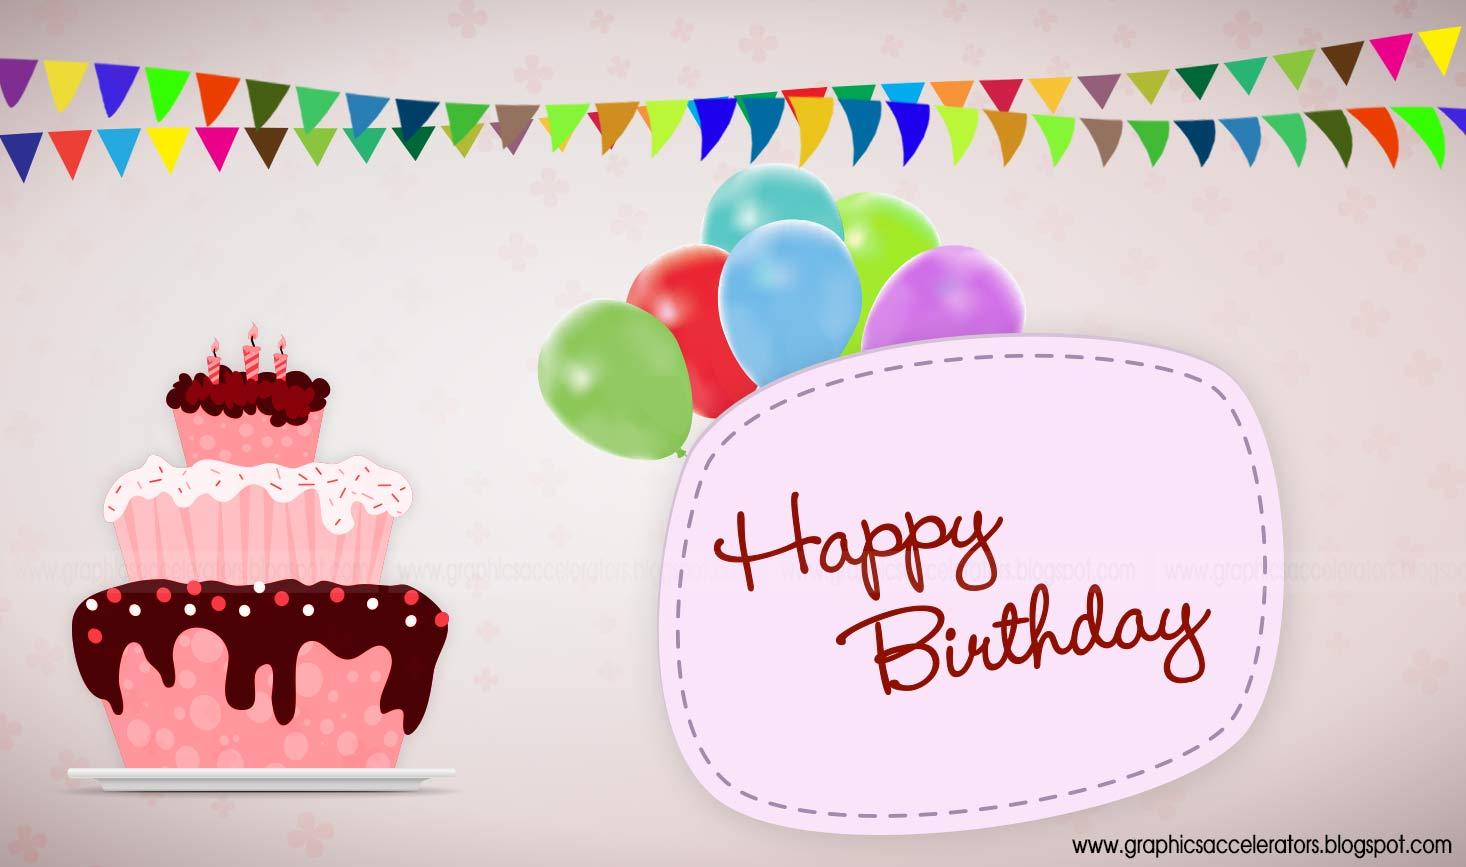 Happy Birthday Cards Happy Birthday Cards For Facebook